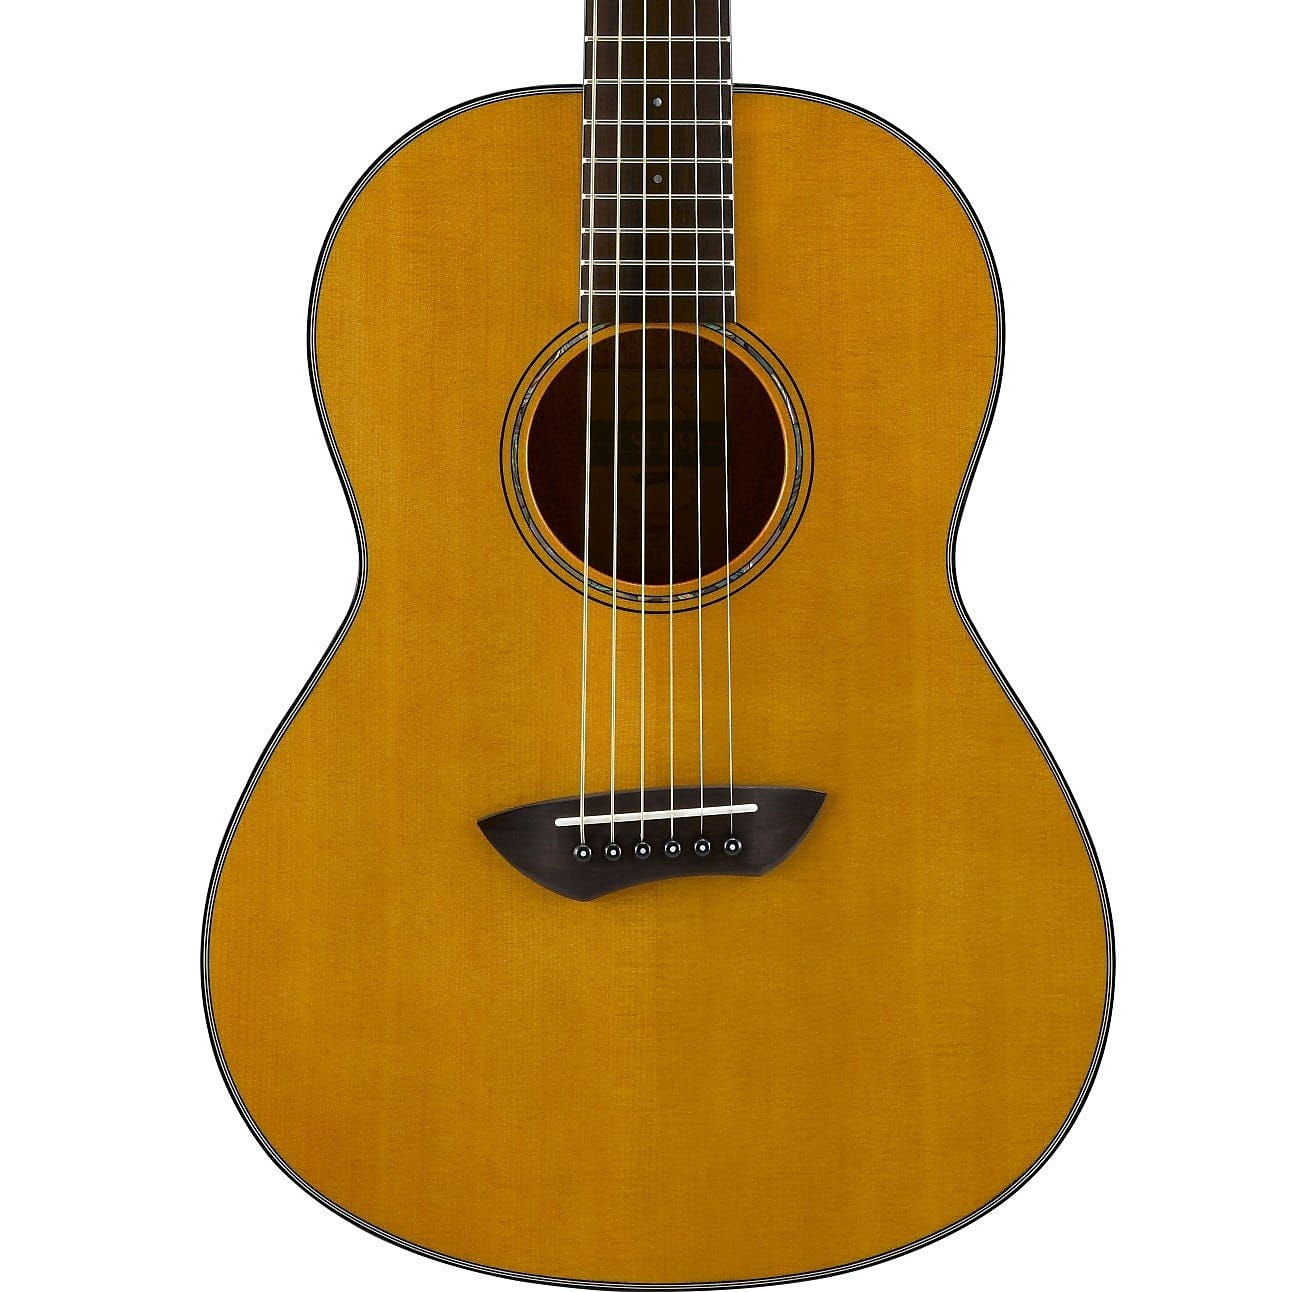 Yamaha CSF1M Compact Folk Acoustic-Electric Guitar with Gigbag